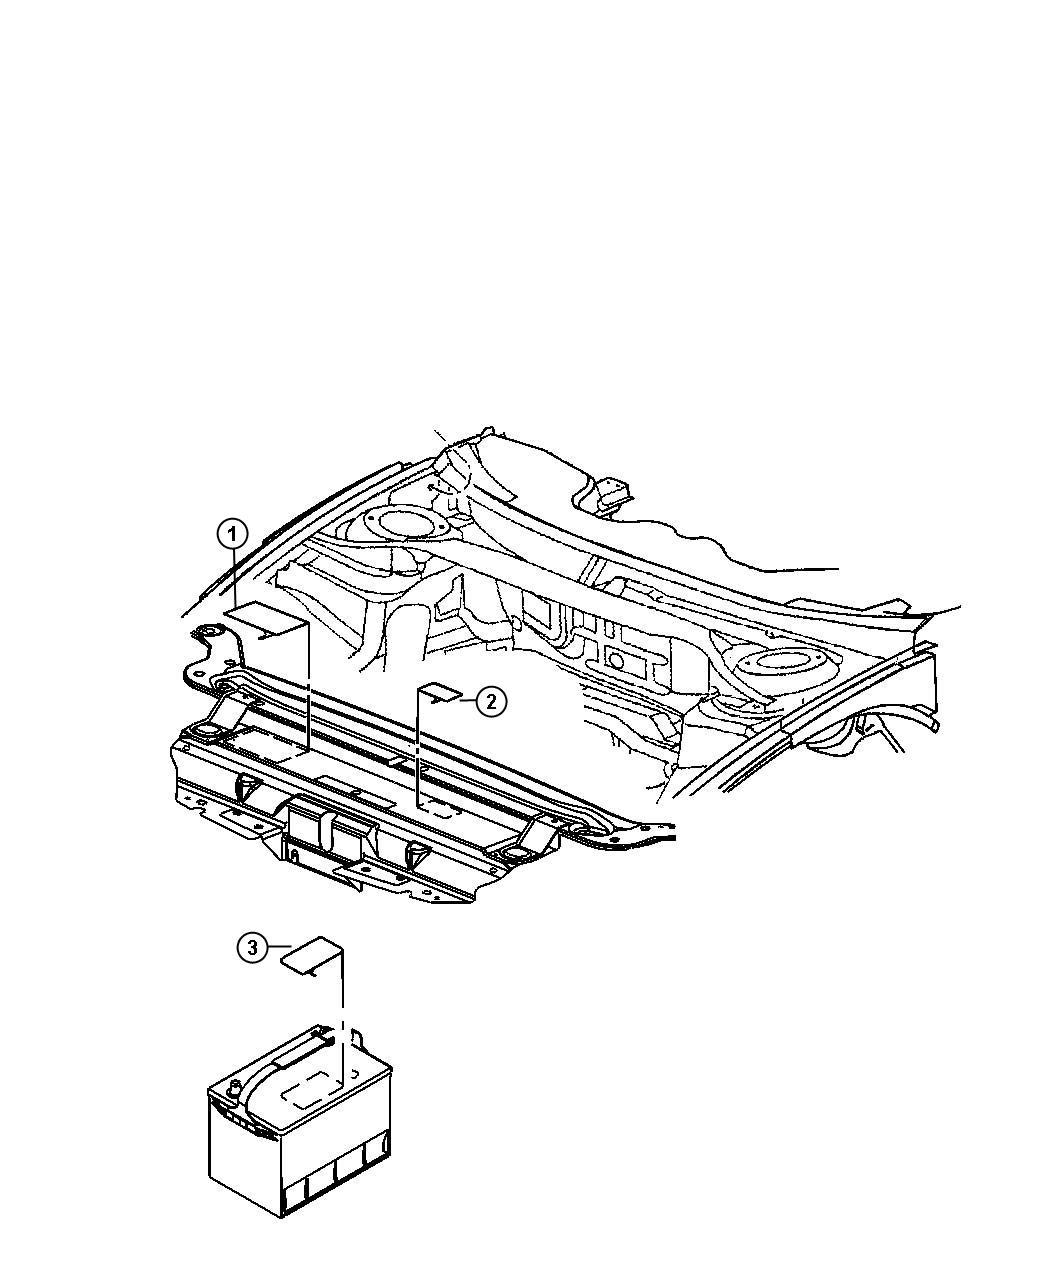 Chrysler 300 Label Battery Battery Warning Canada